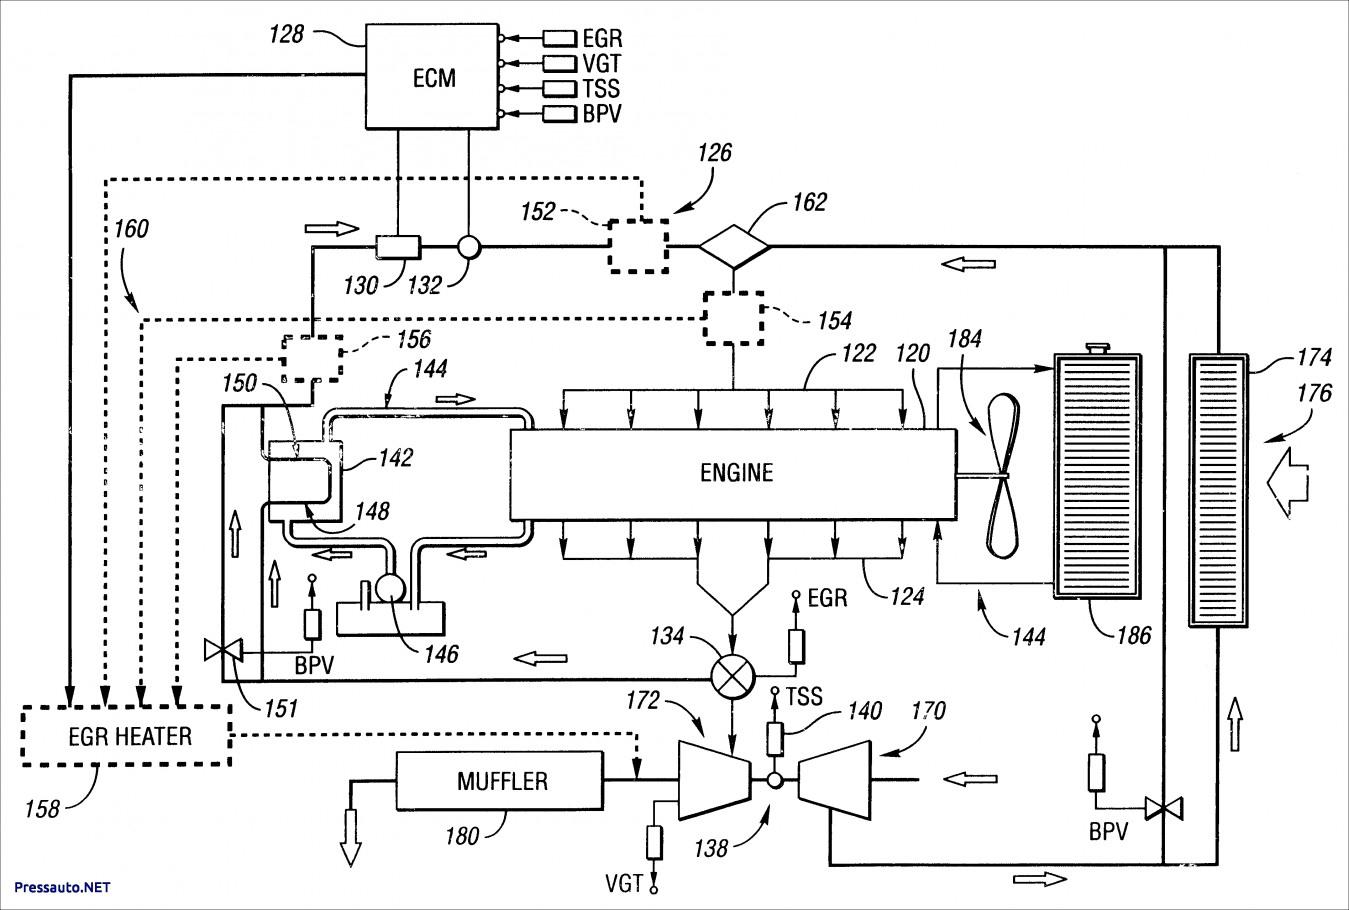 Gx160 Wiring Diagram - Data Wiring Diagram Today - Honda Gx160 Electric Start Wiring Diagram